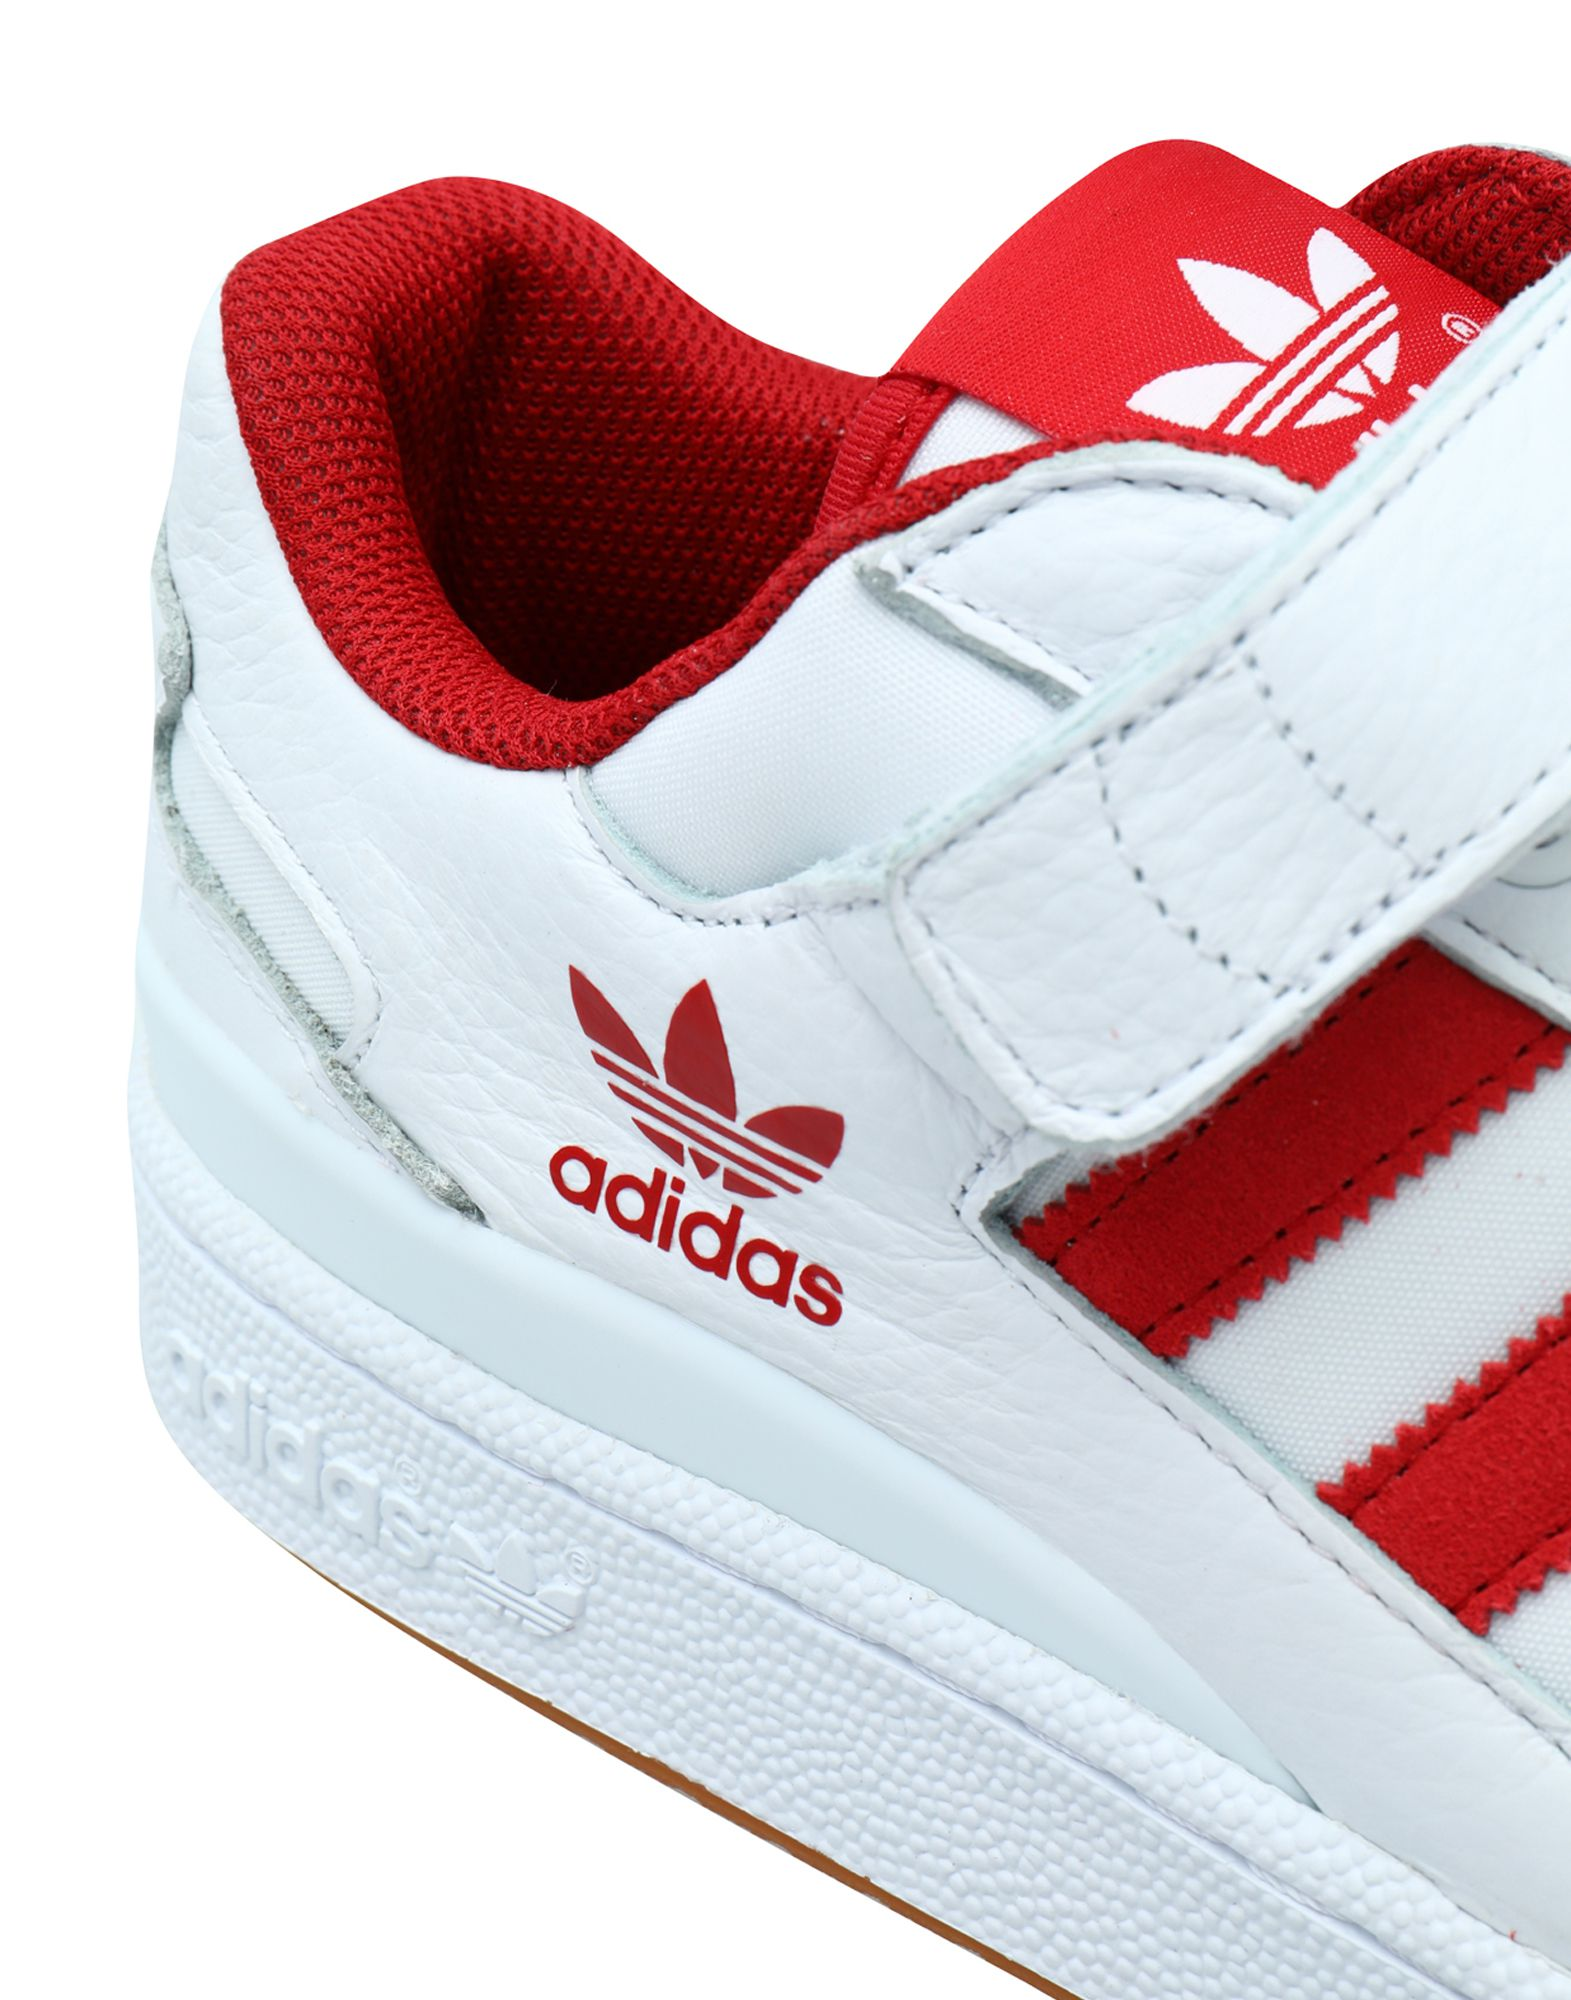 Homme Nouvelles Baskets Adidas Originals Lo Forum IYwY7Pxpq